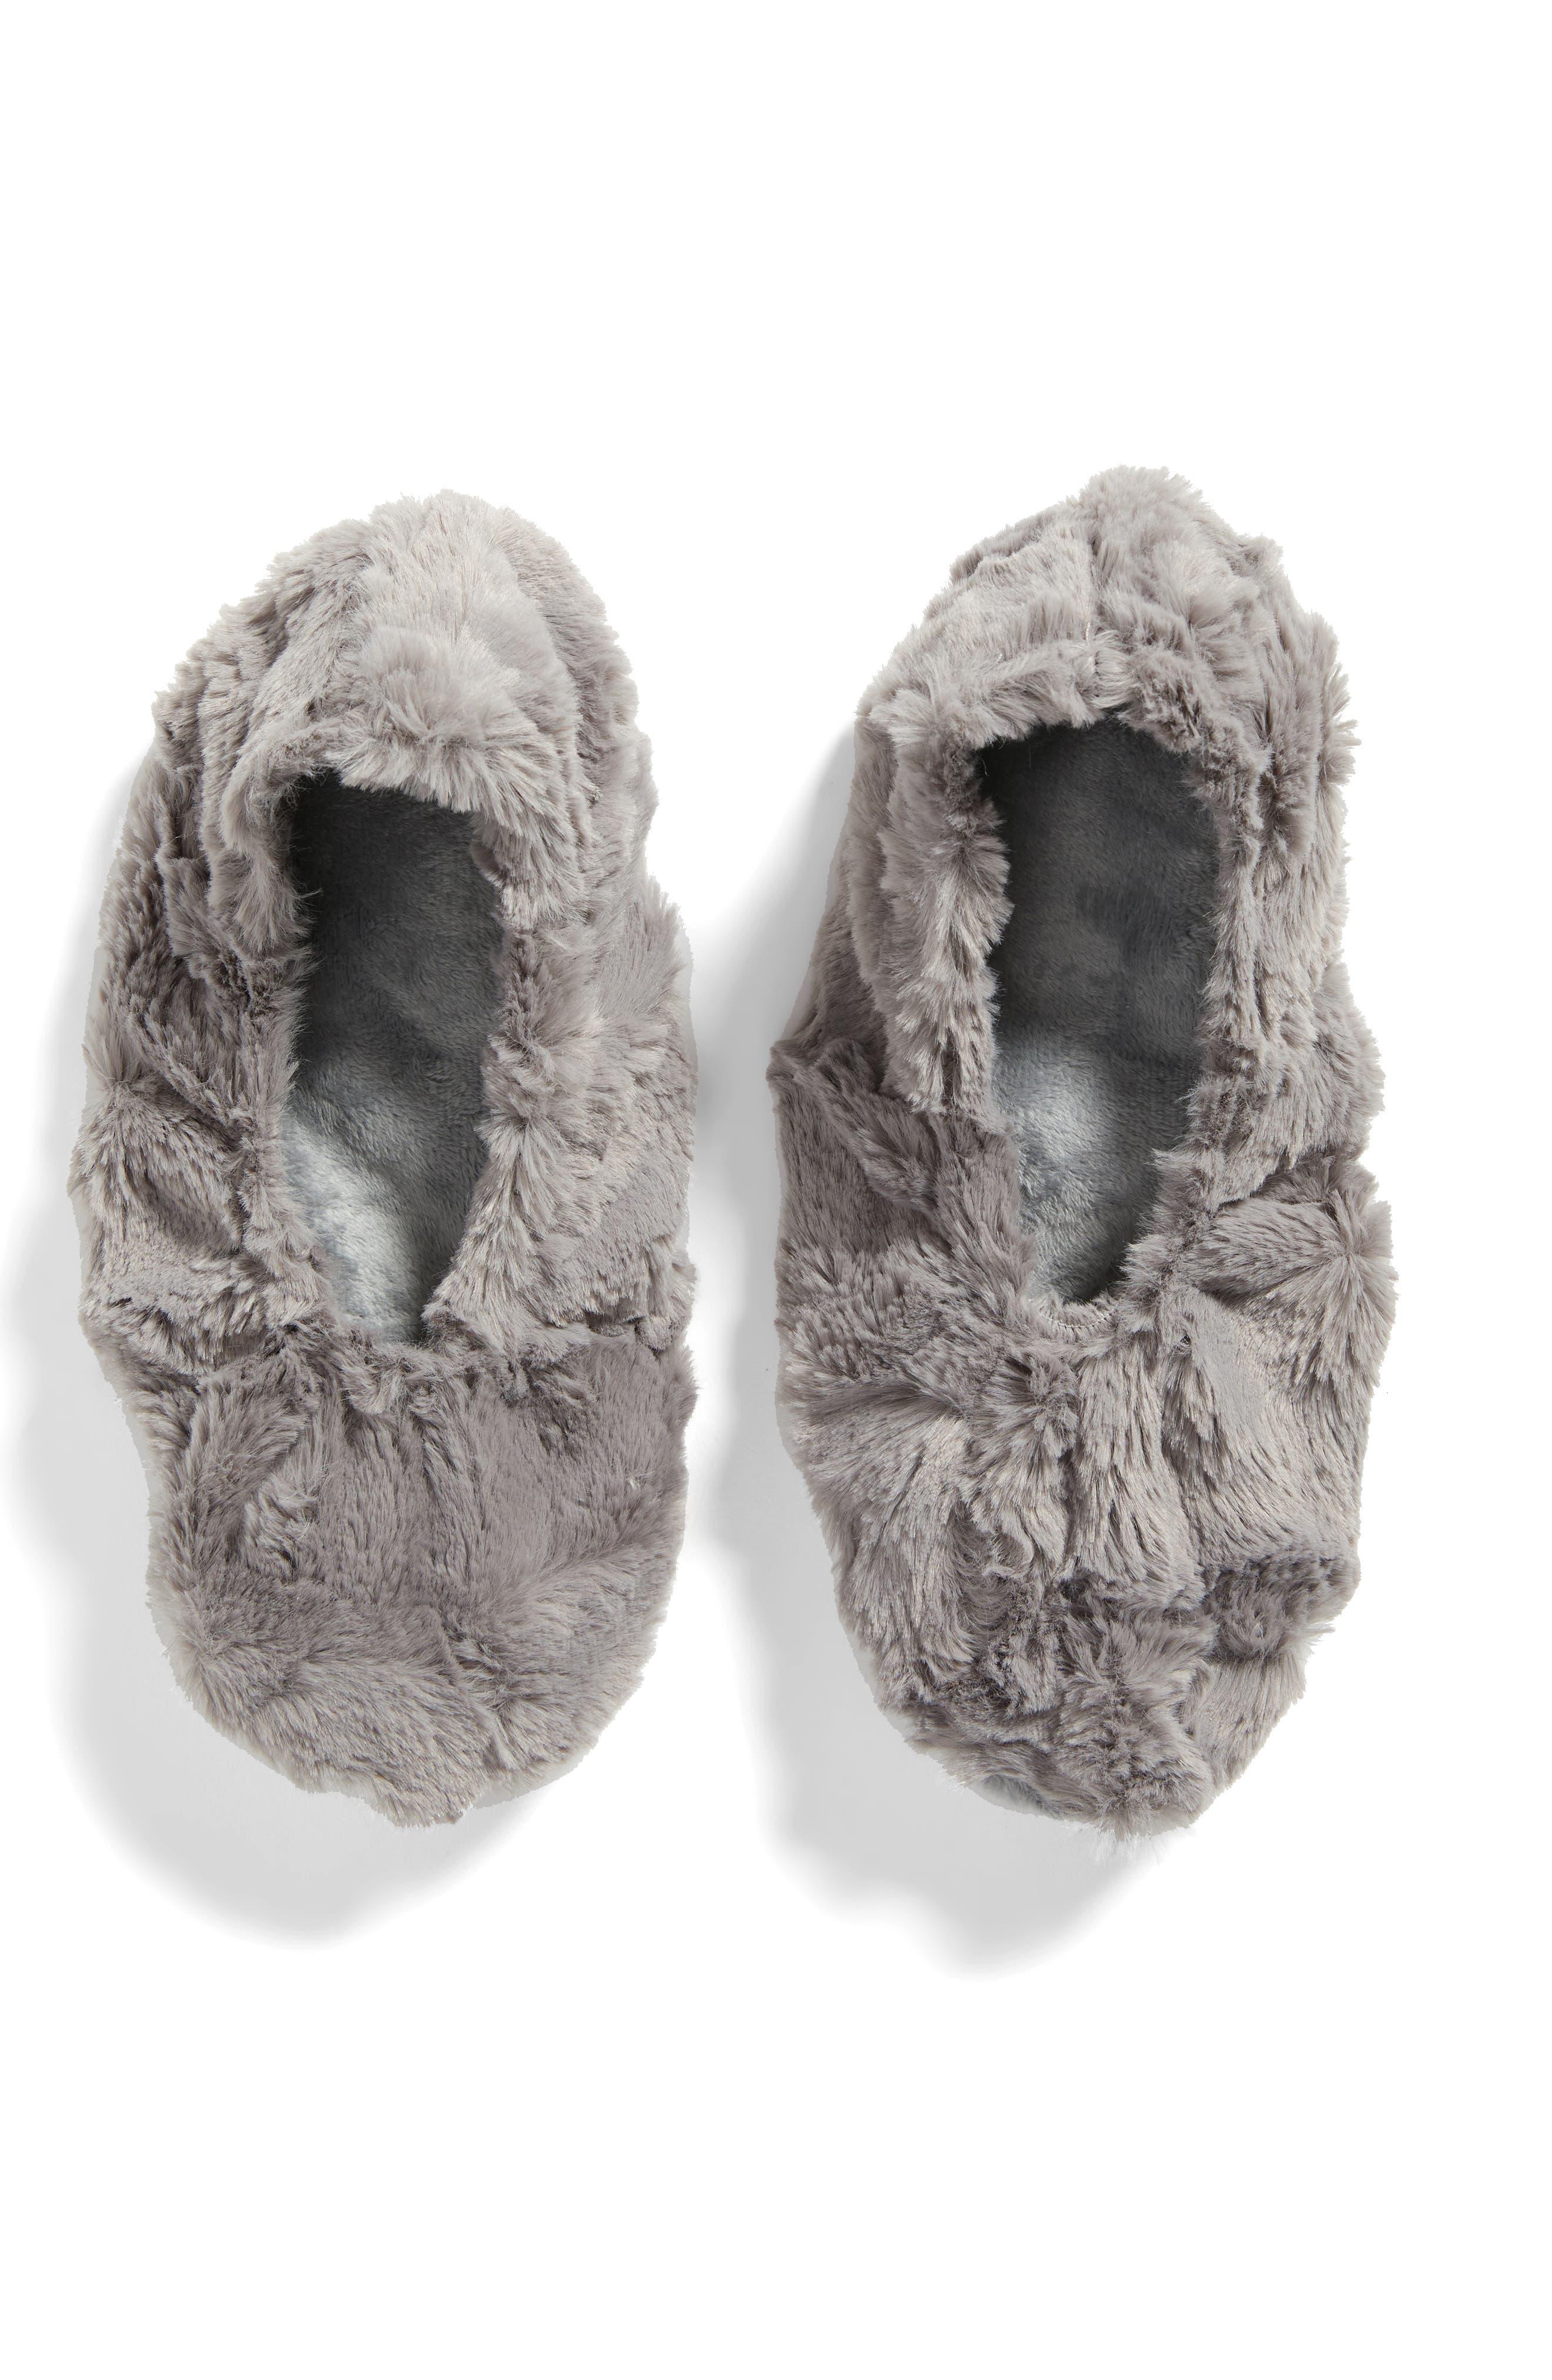 Alternate Image 1 Selected - Sonoma Lavender Stonehide Footies